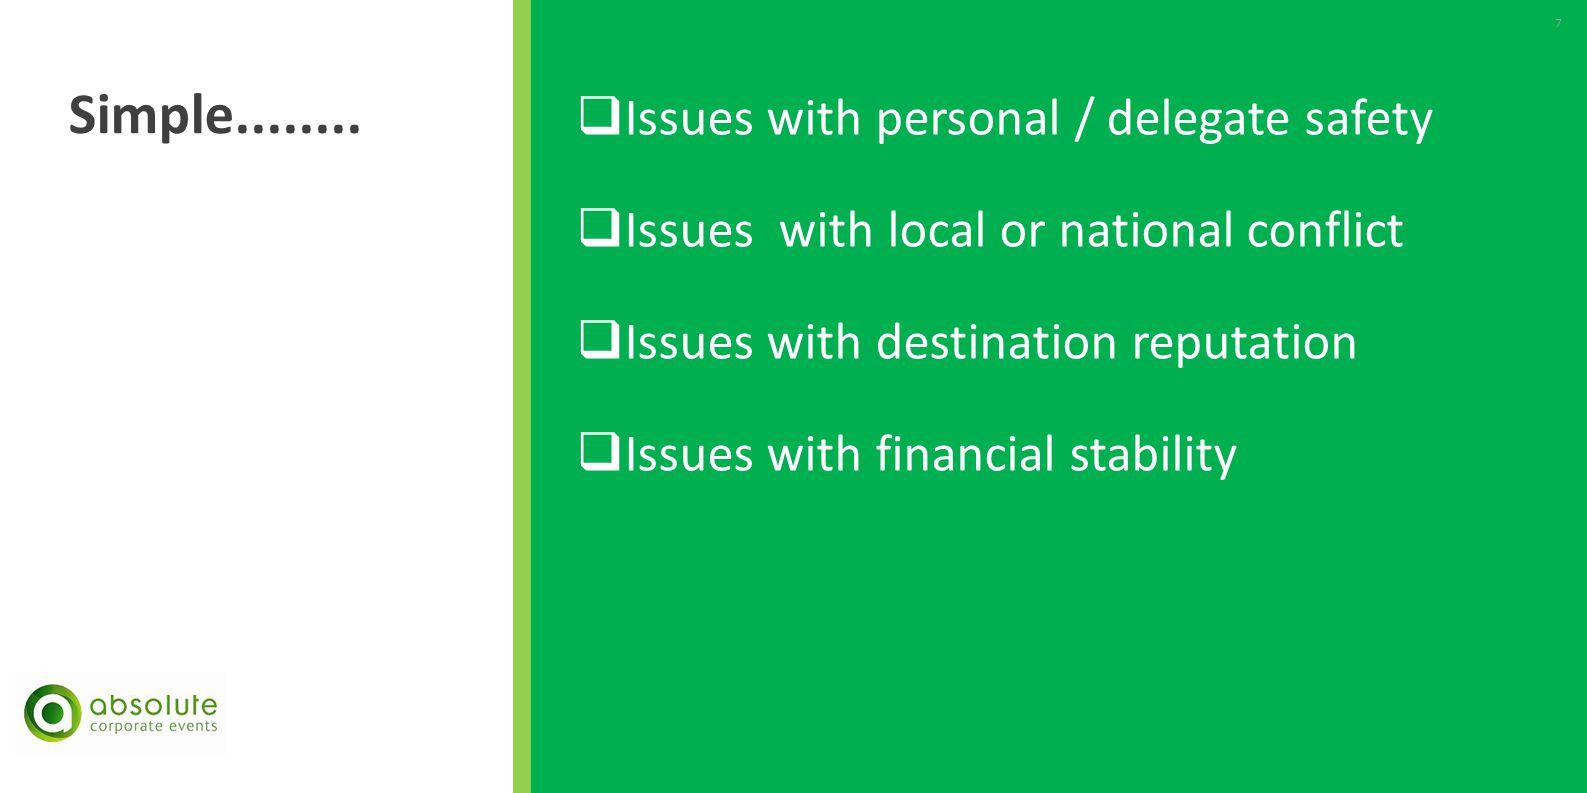 Criteria for Destination Selection - Client